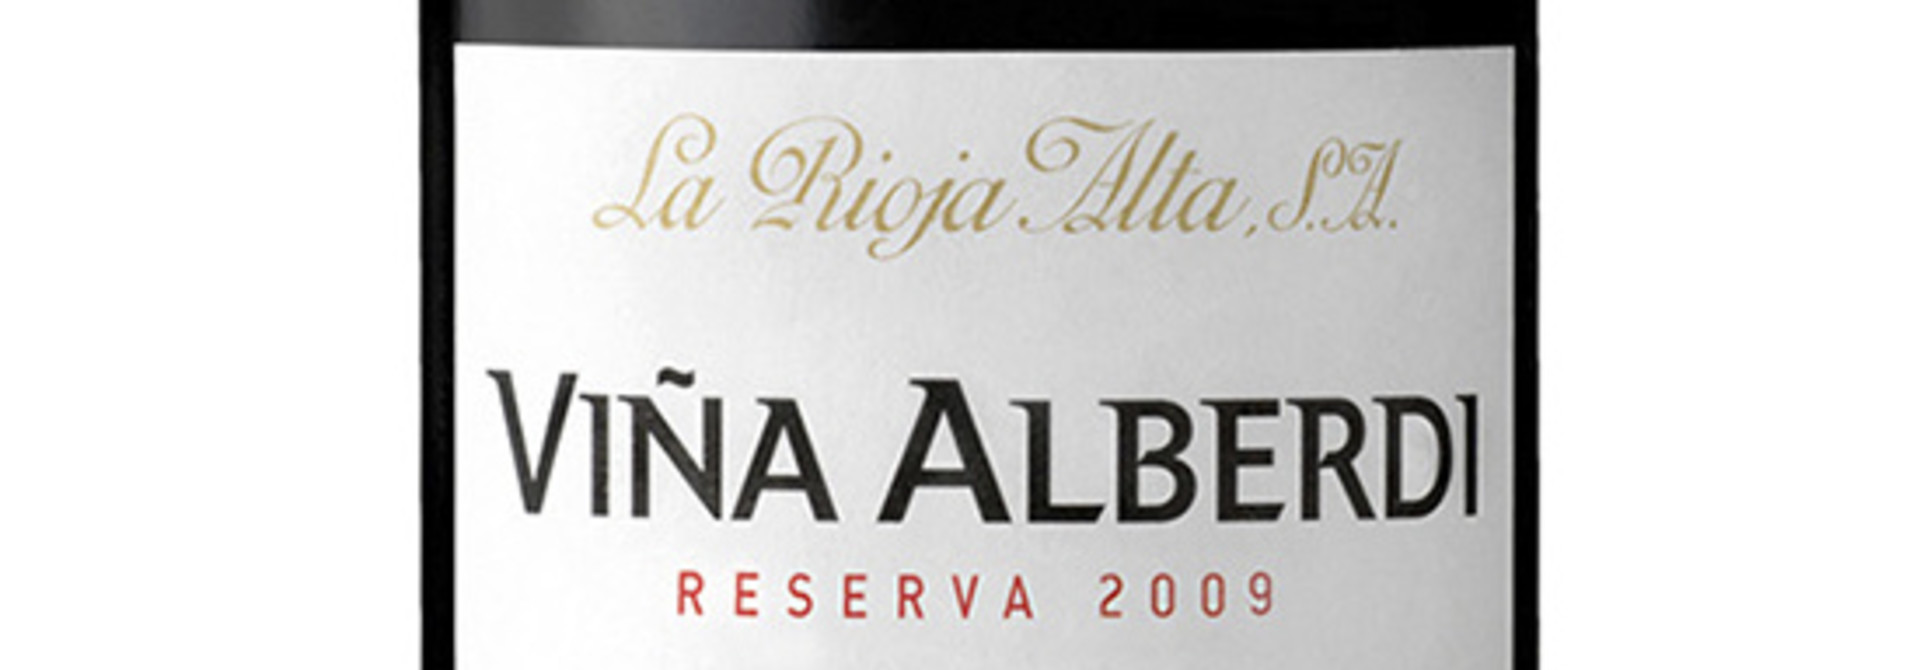 La Rioja Alta Reserva, Viña Alberdi 2014 - Demi (0,375L)